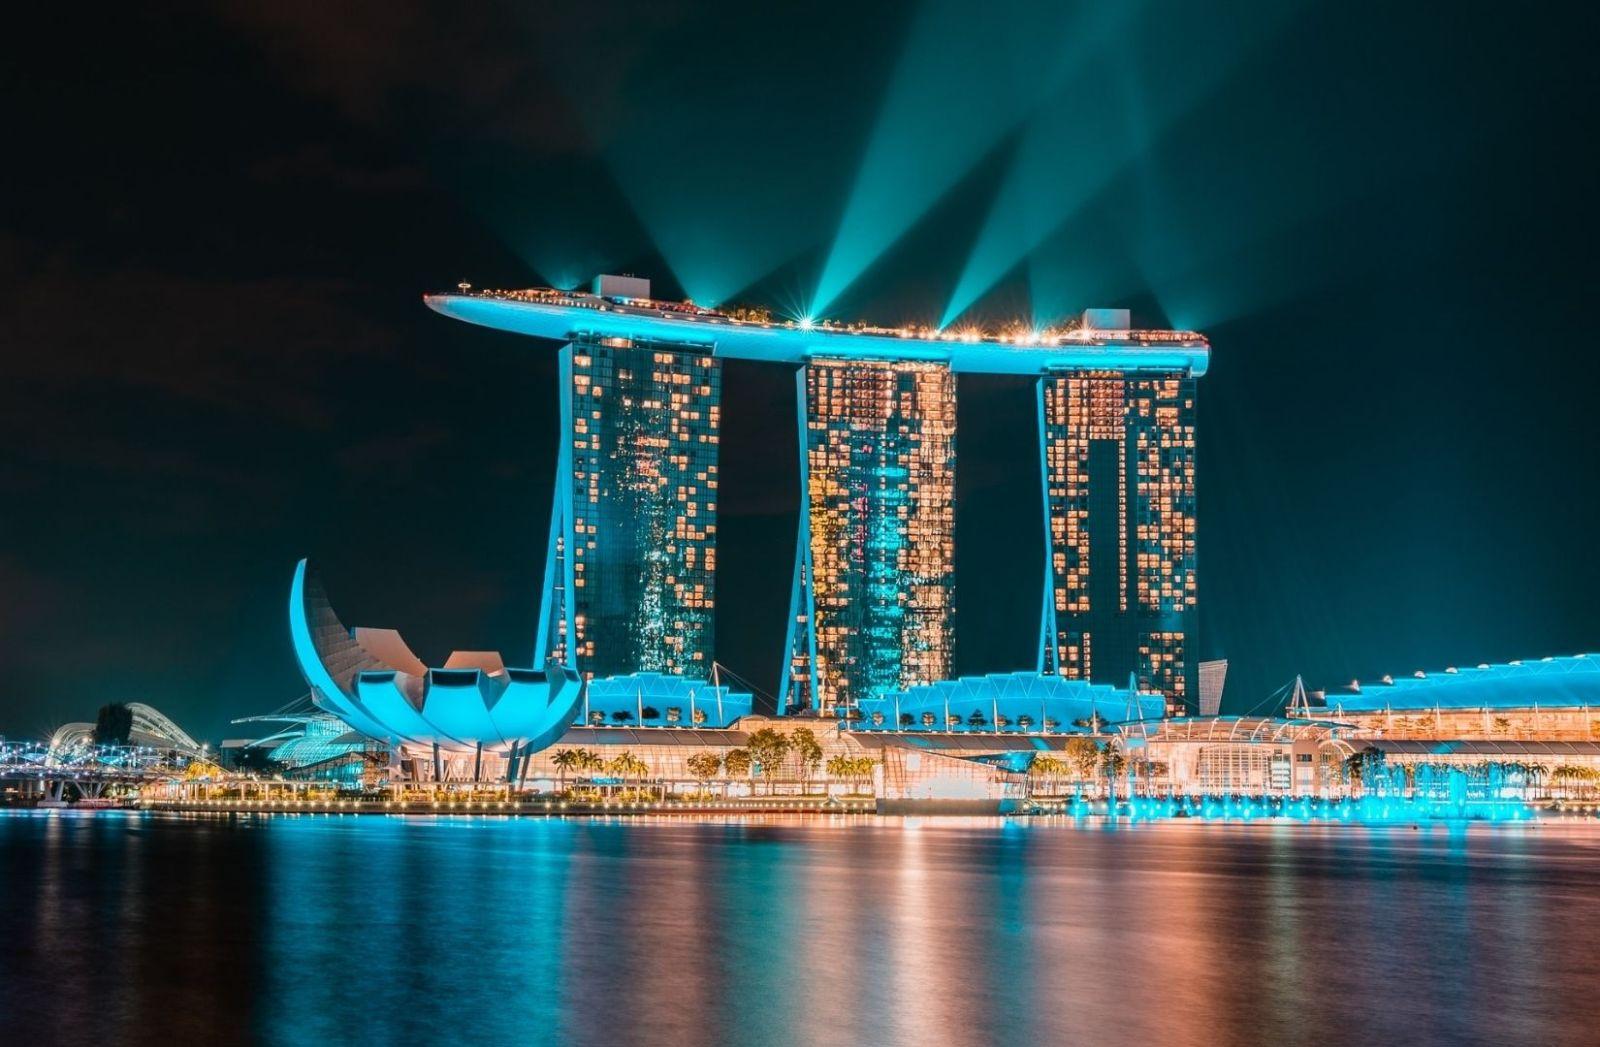 Das Marina Bay Sands in Singapore erinnert an Science Fiction (Foto: Shawnn Tan, Unsplash.com)